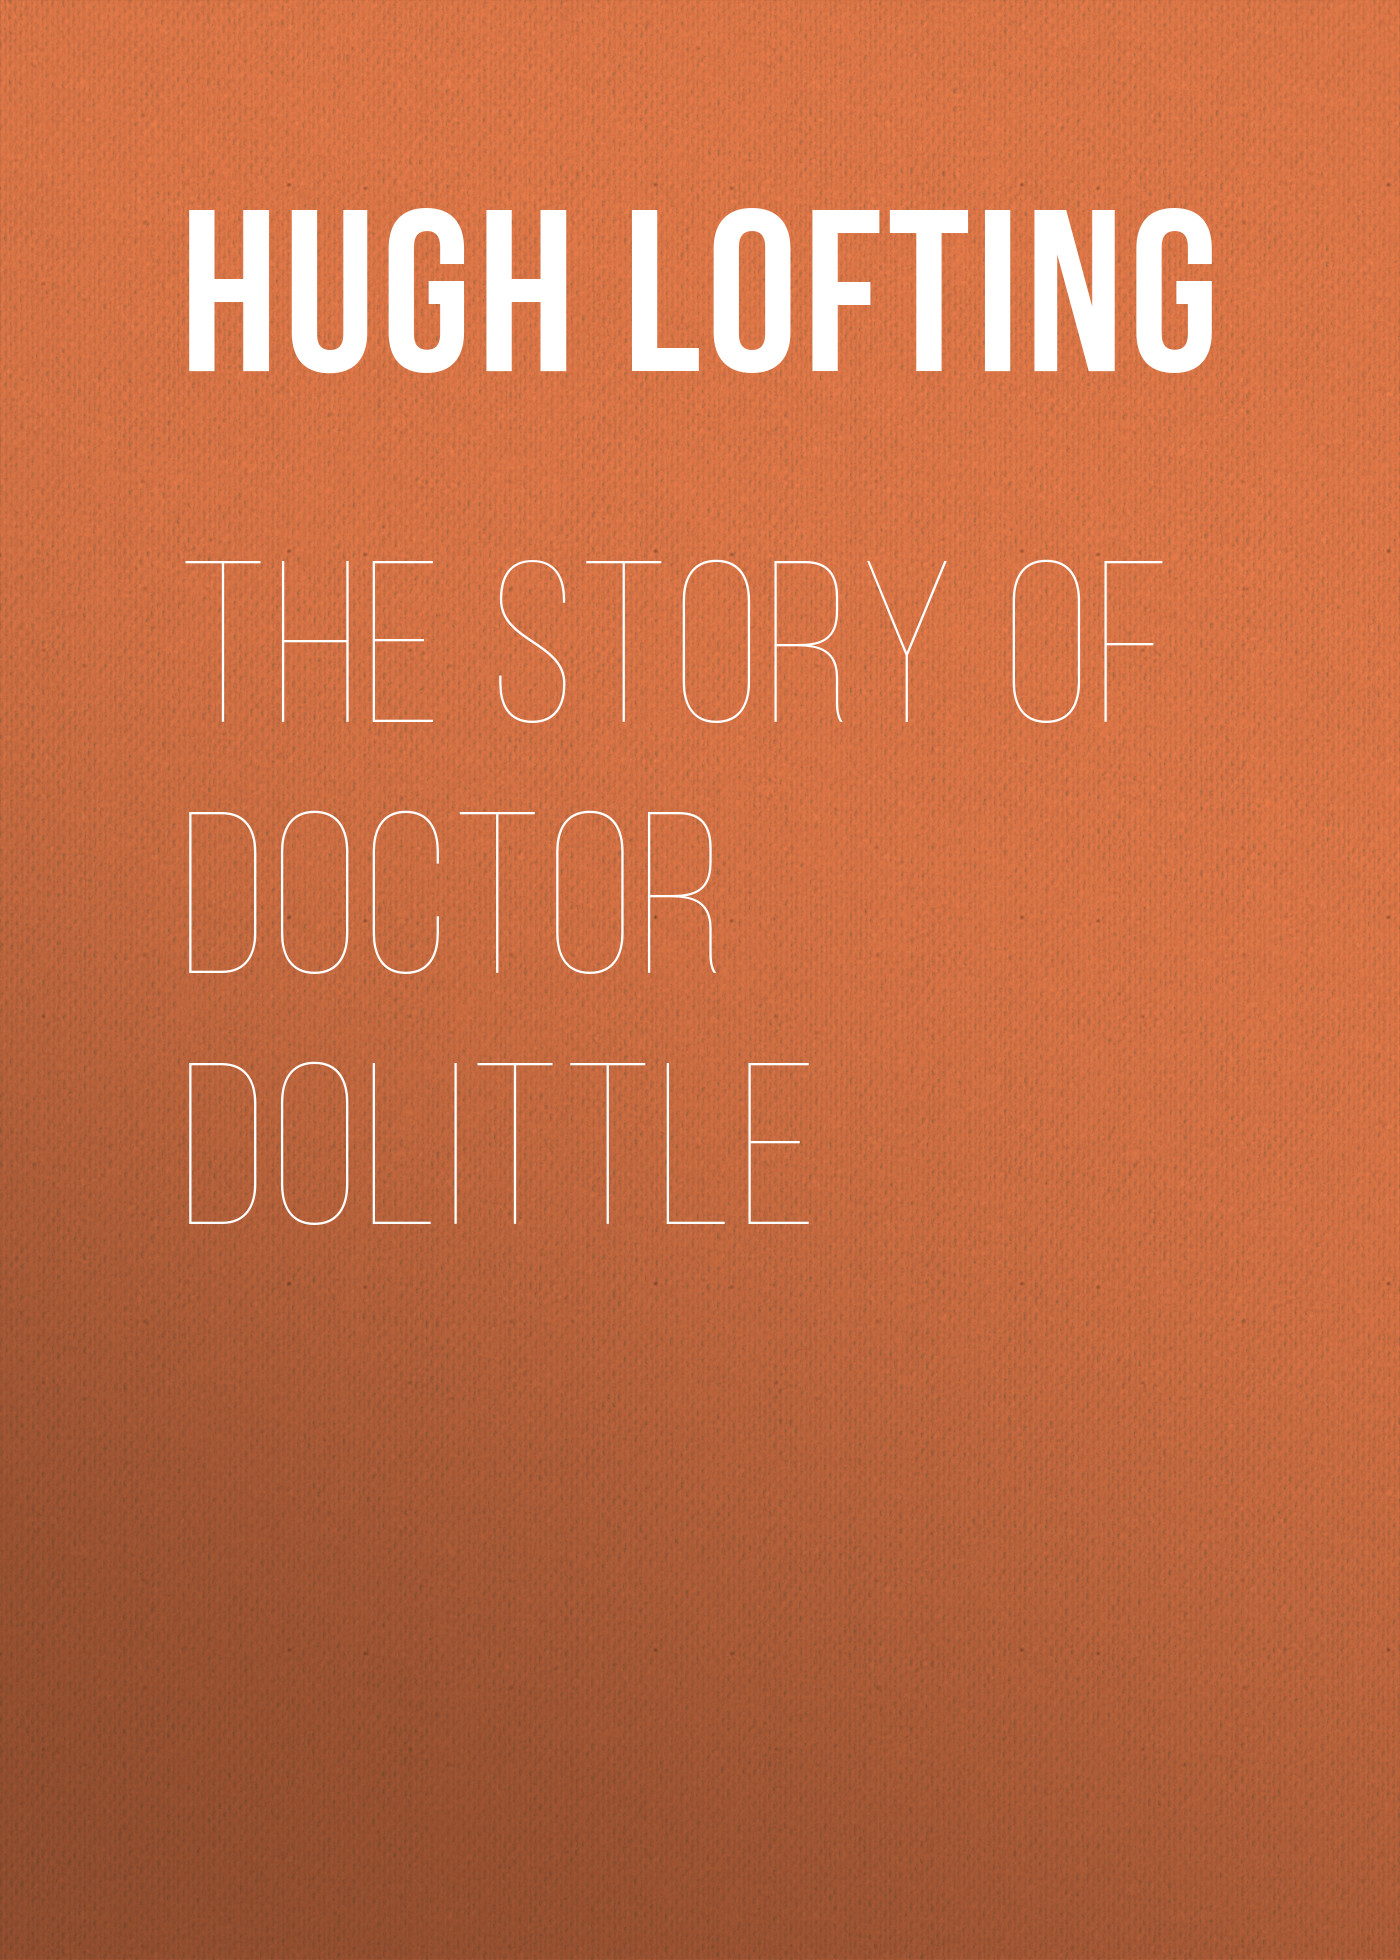 Hugh Lofting The Story of Doctor Dolittle недорого